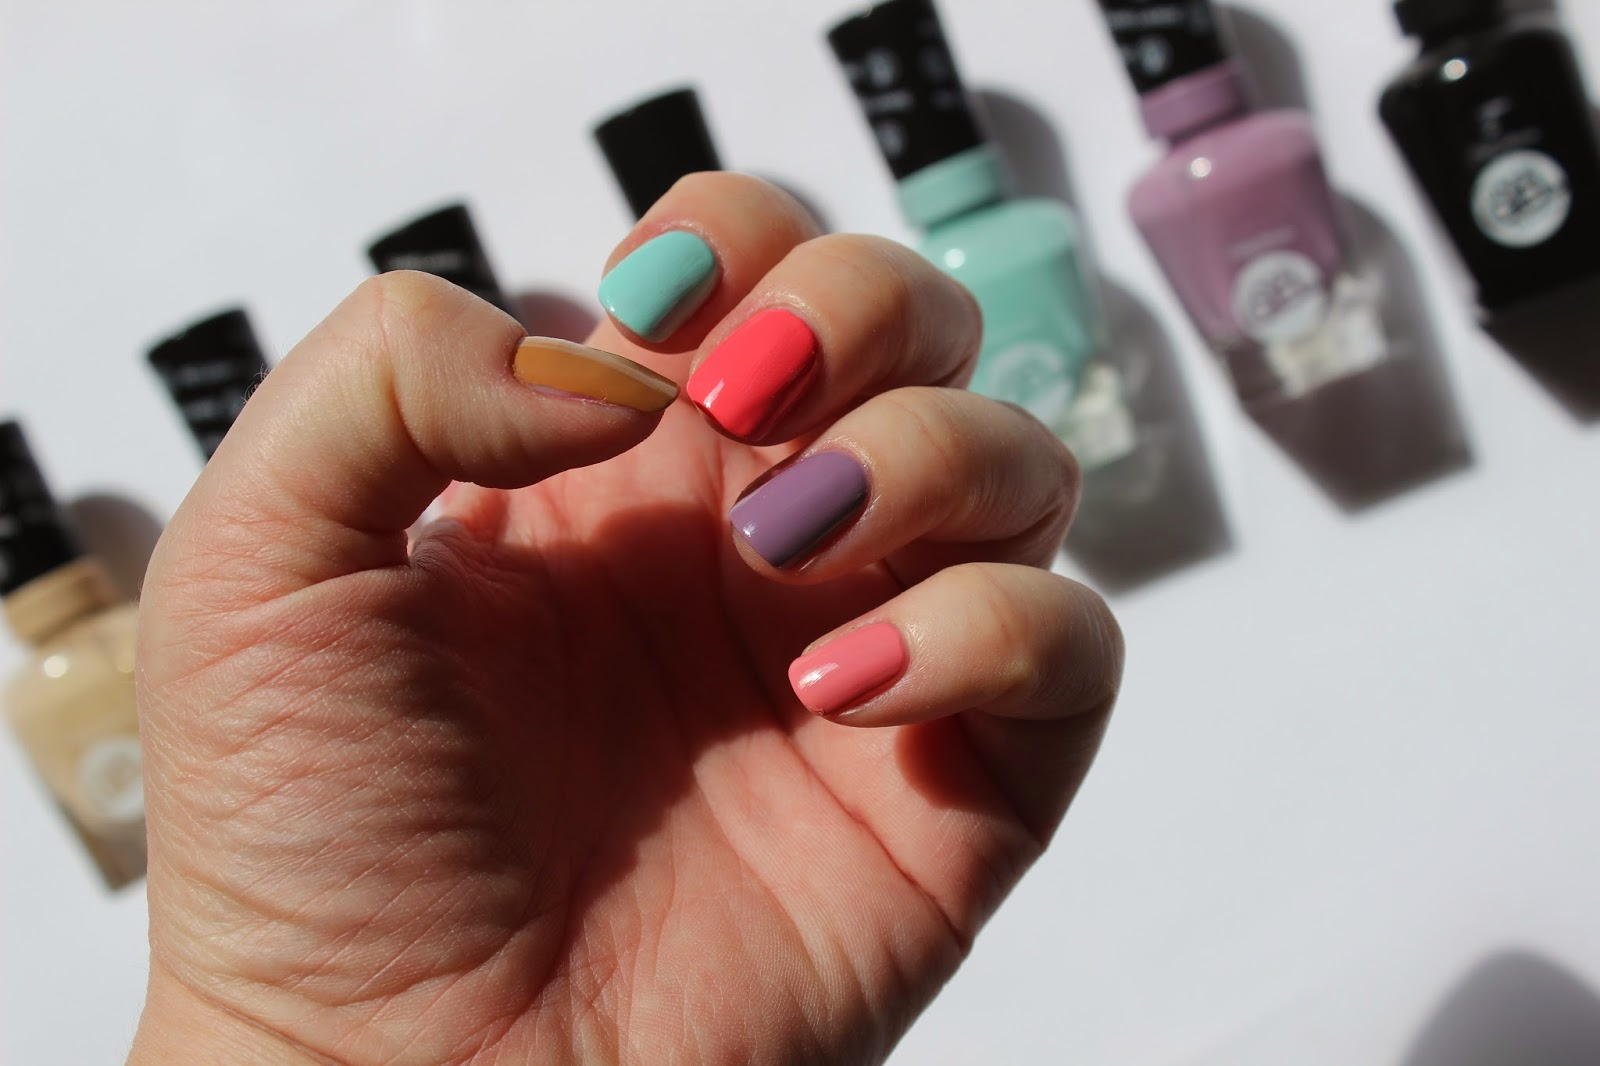 Sally Hansen Miracle Gel Czyli Manicure Zelowy Subiektywnablog